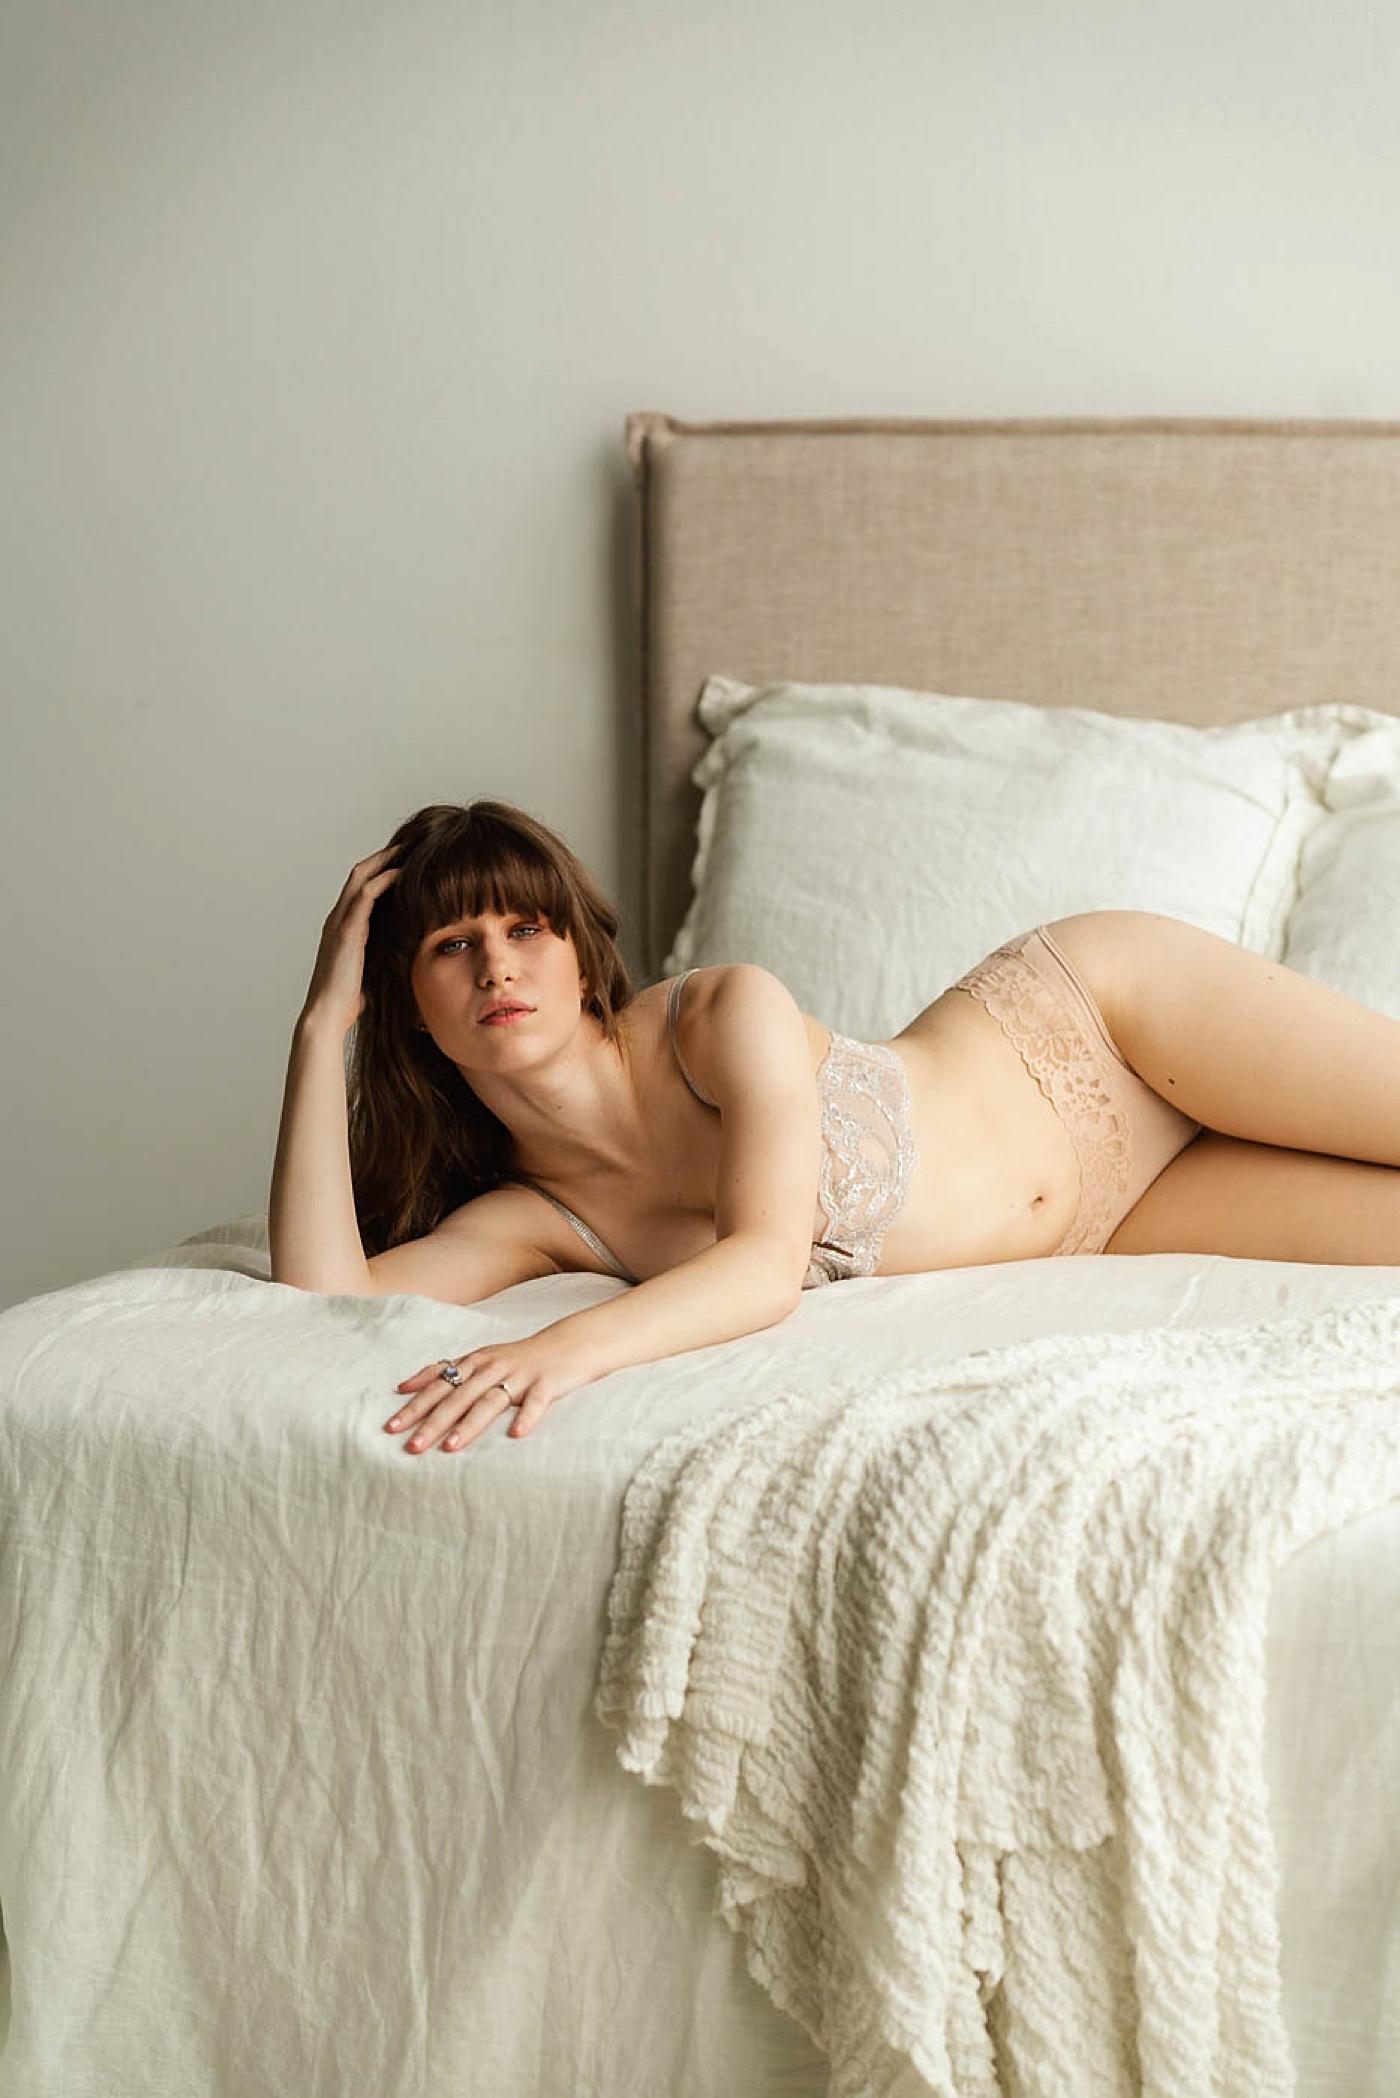 tasteful_boudoir_photo_session_austin_tx_0496.jpg